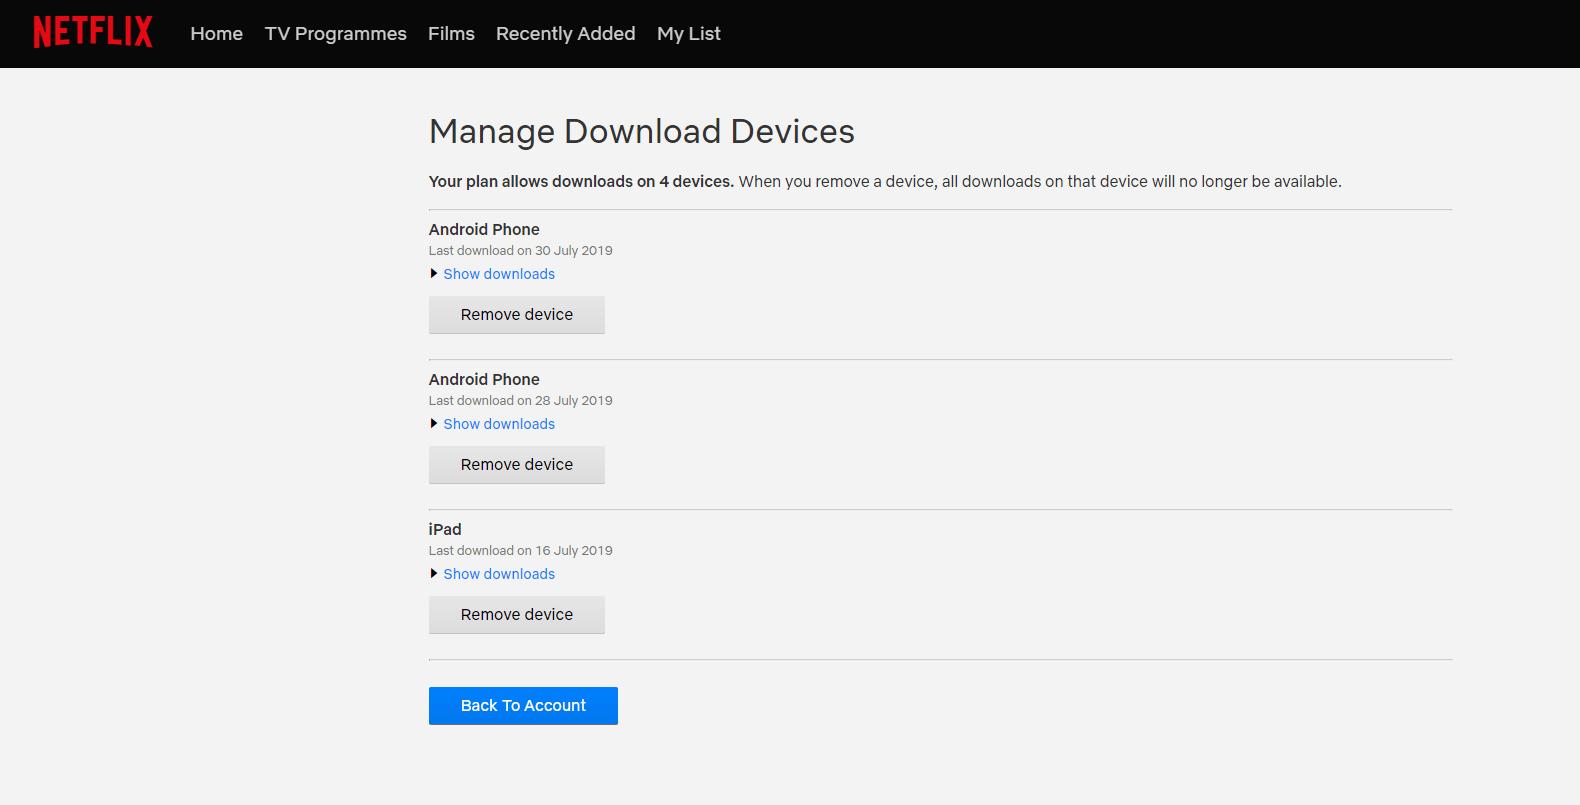 Lock Device To Remove